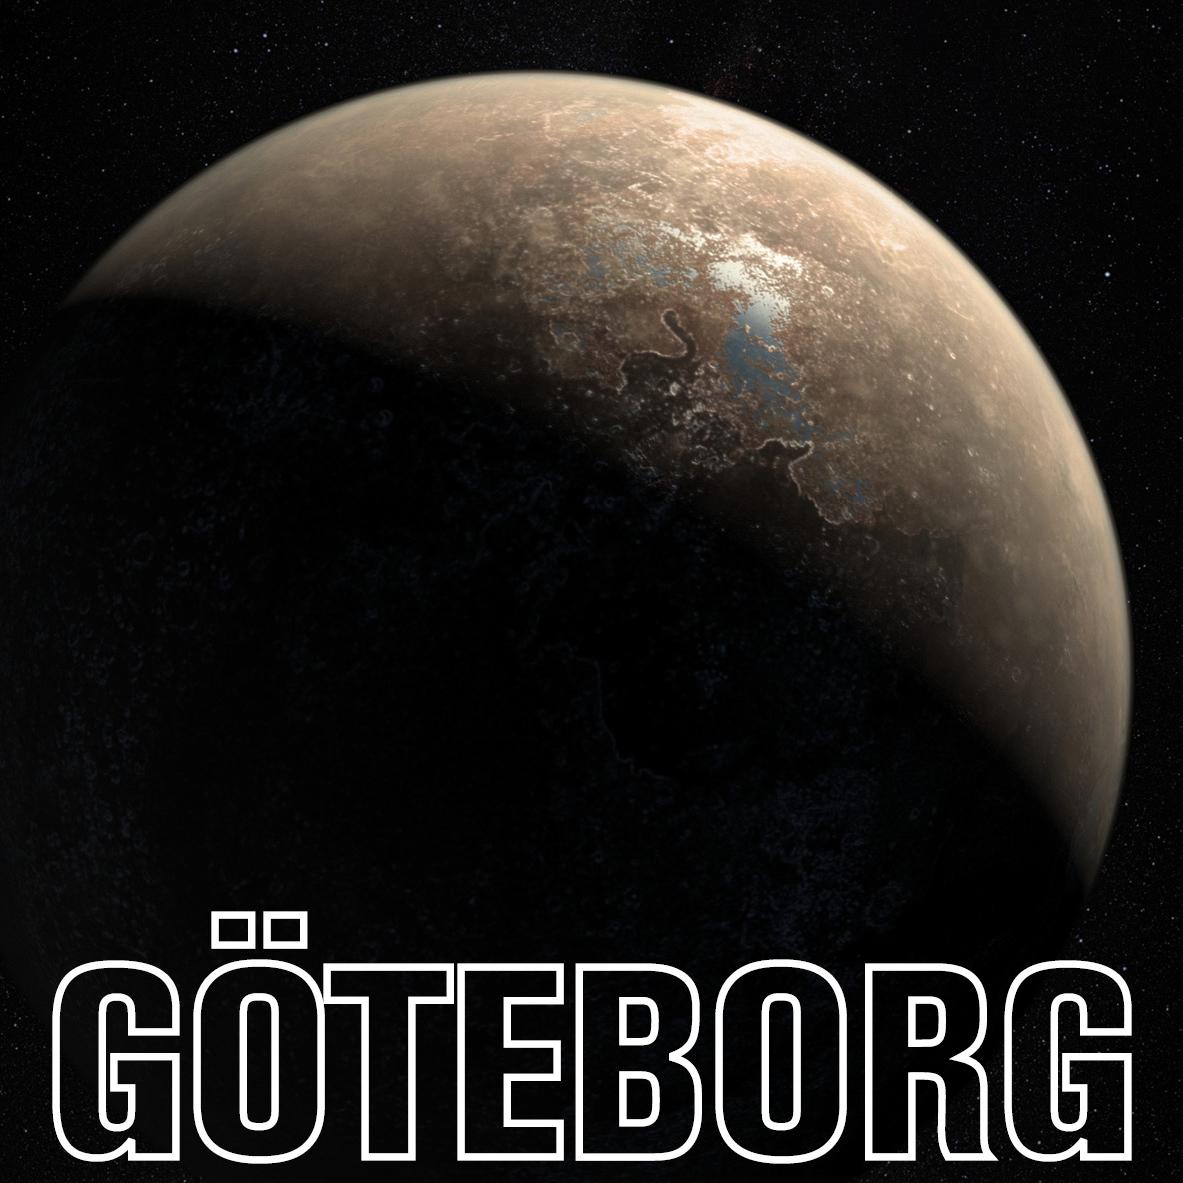 Exoplanet. Illustration: ESO/M. Kornmesser